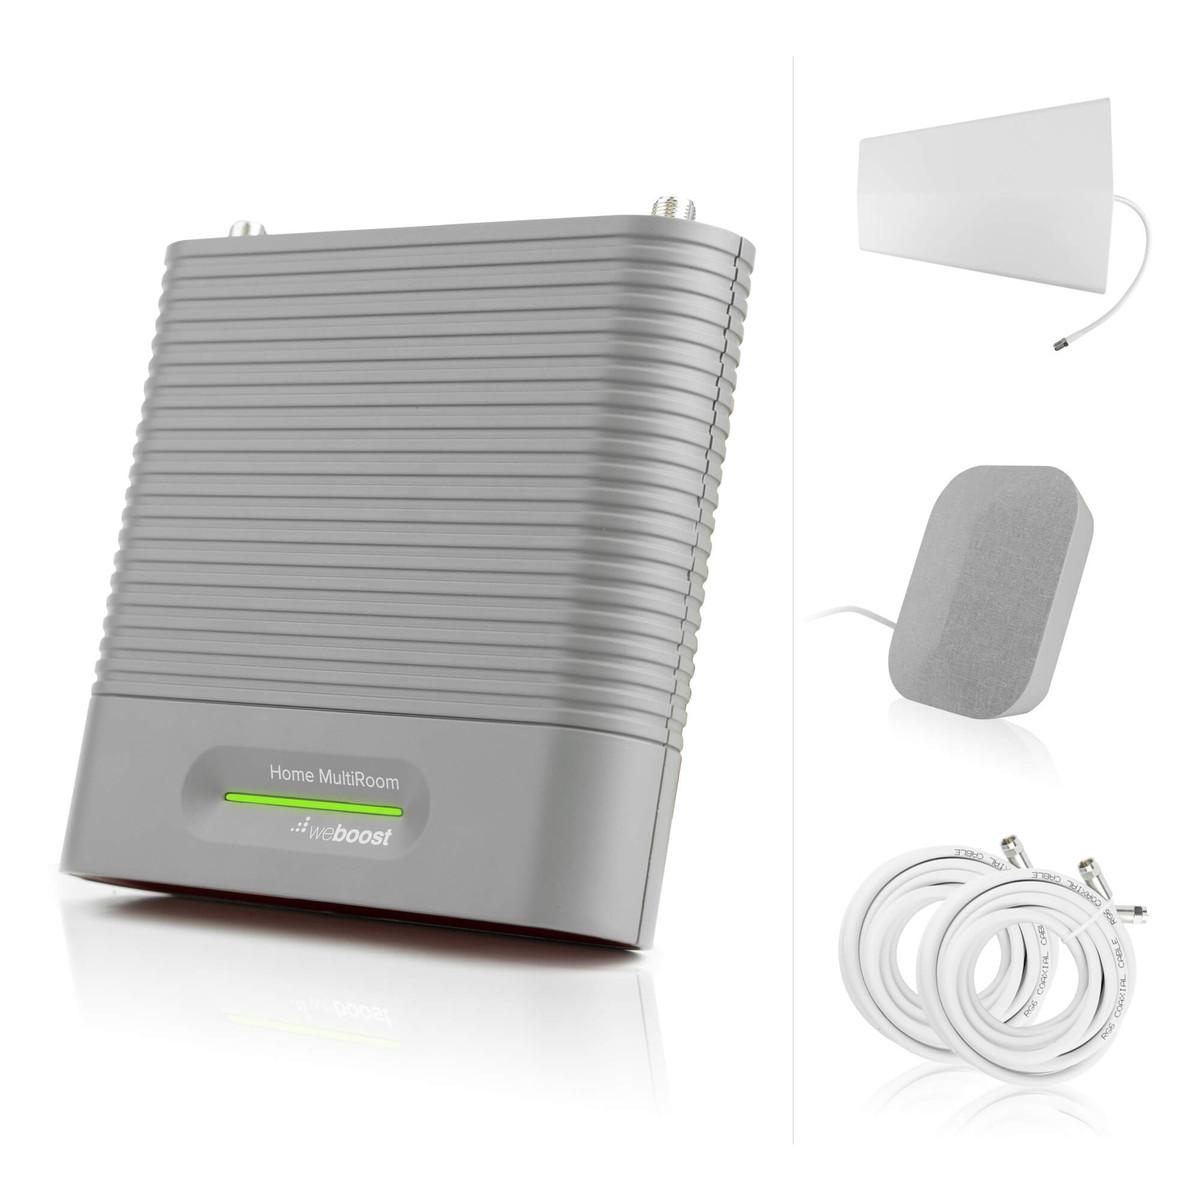 weBoost Home MultiRoom Signal Booster Kit